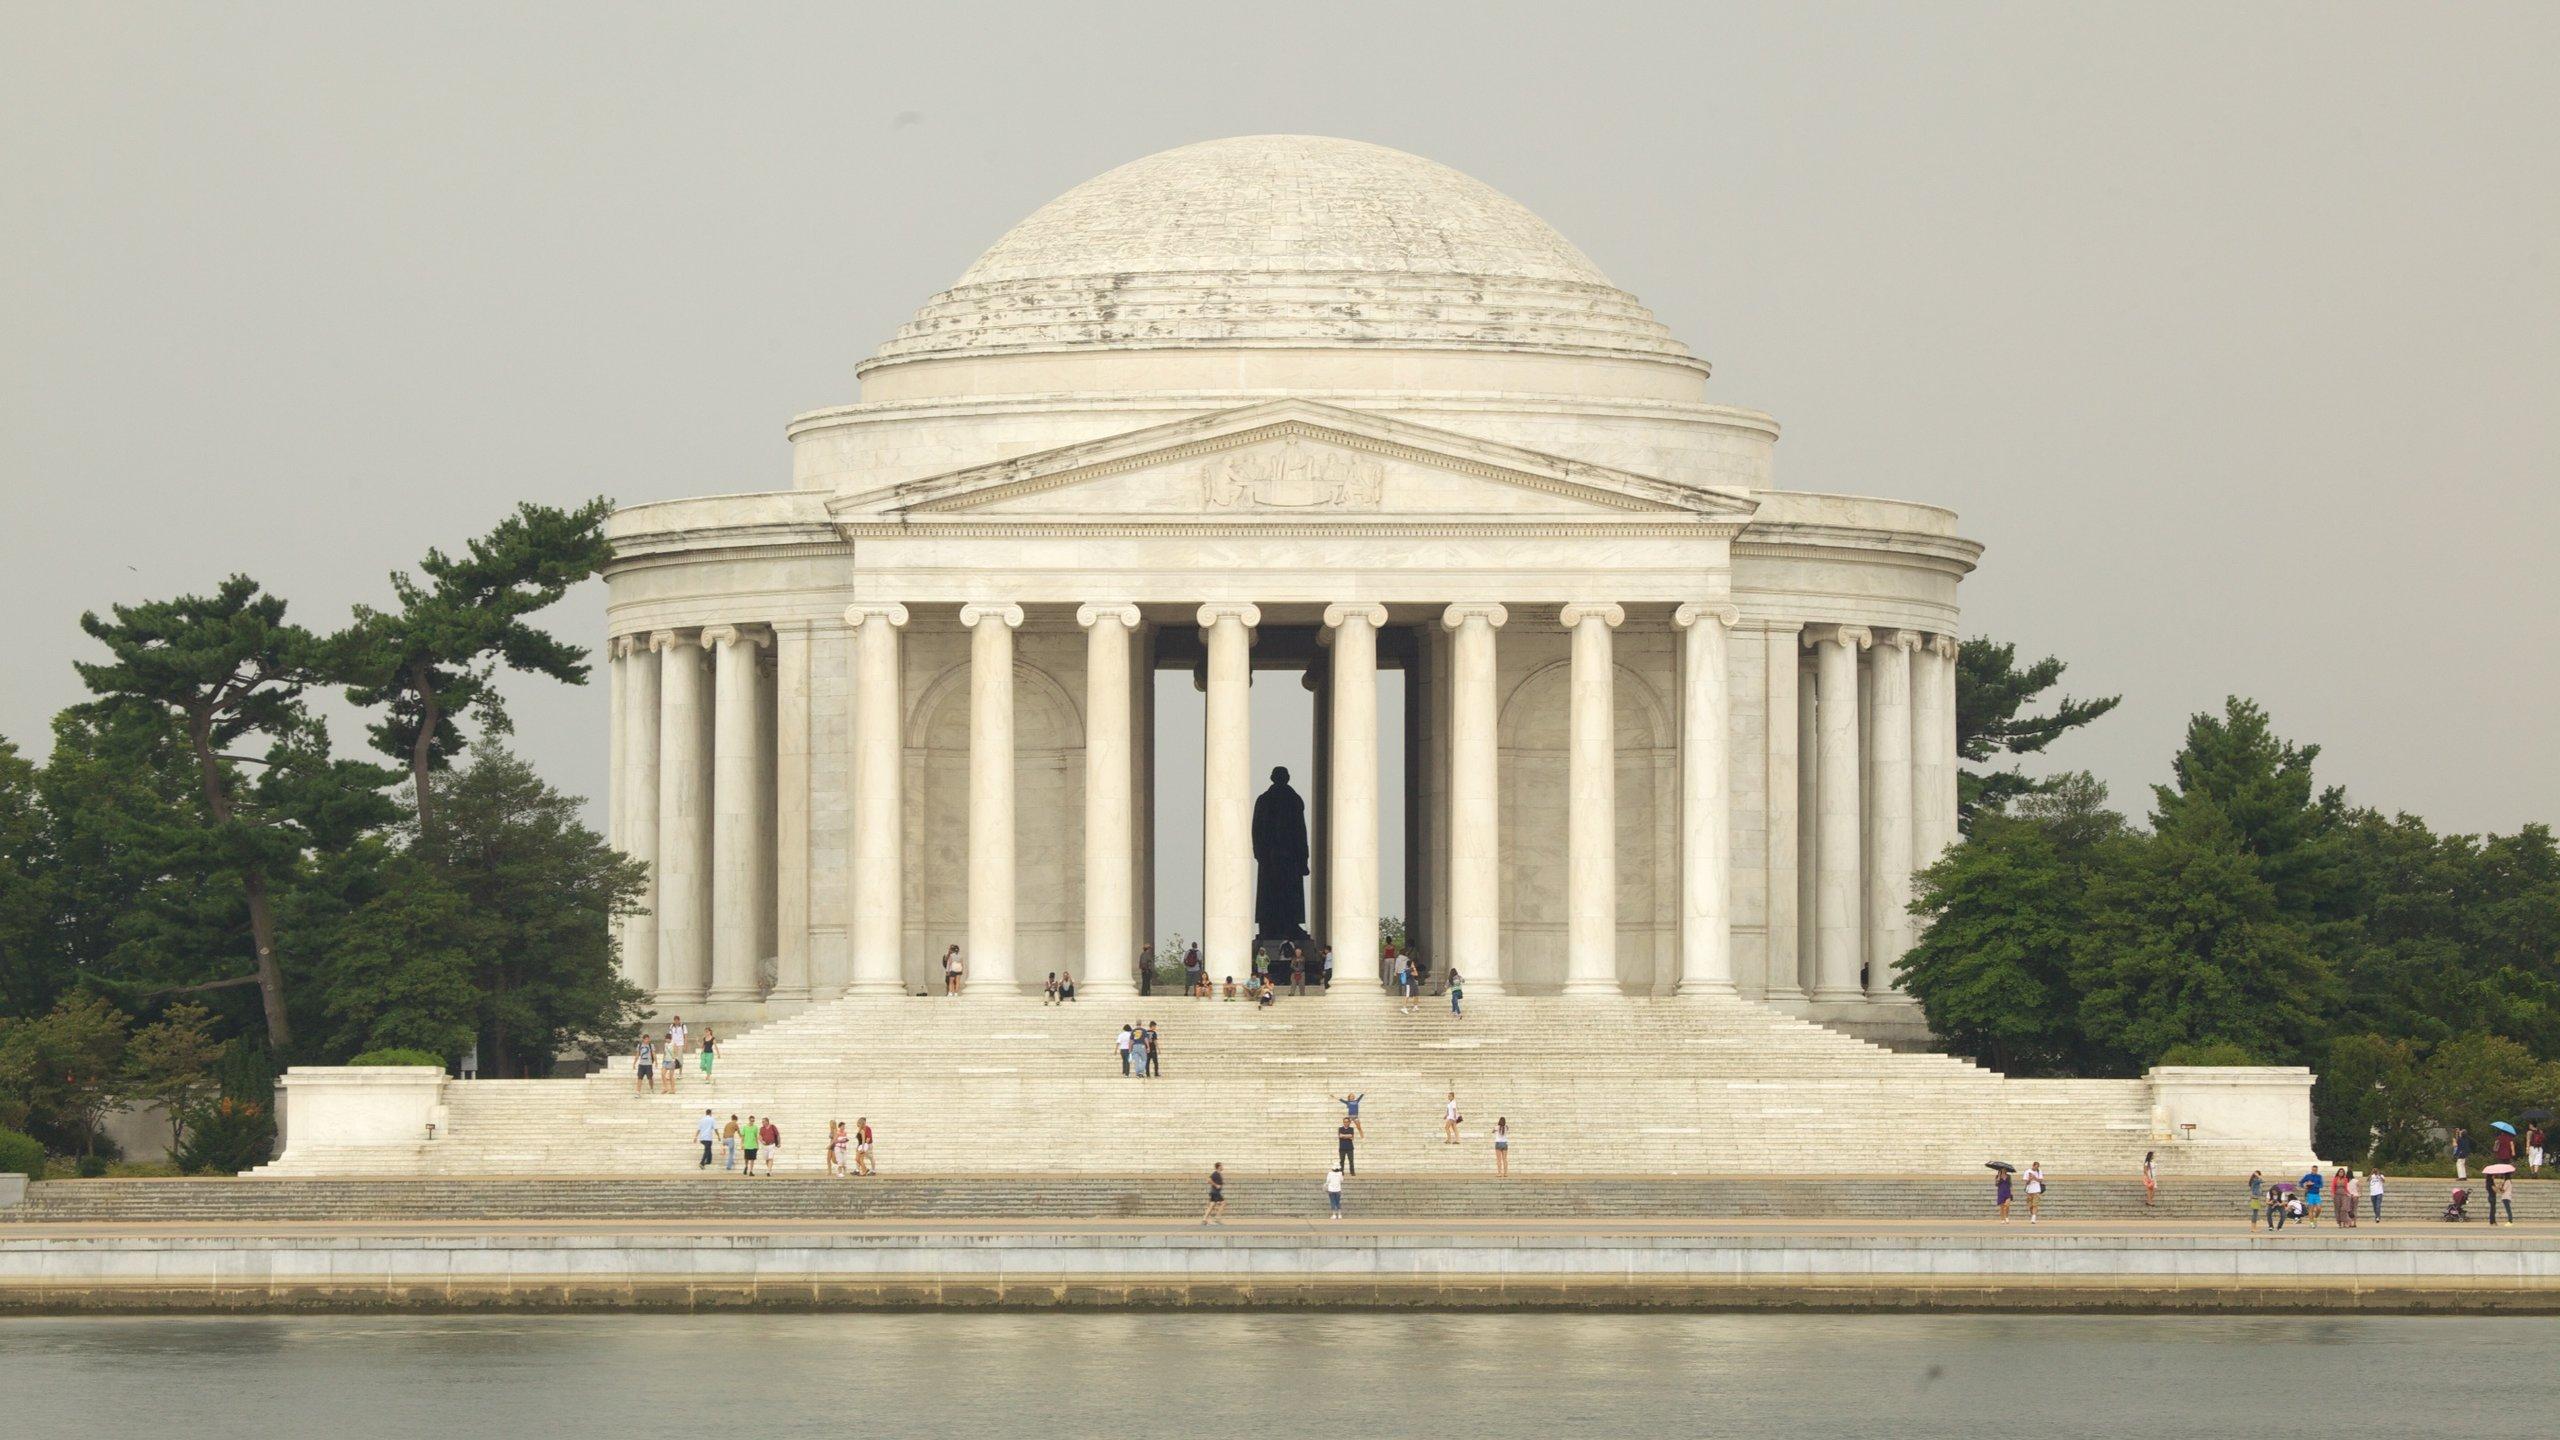 Washington, District of Columbia, United States of America